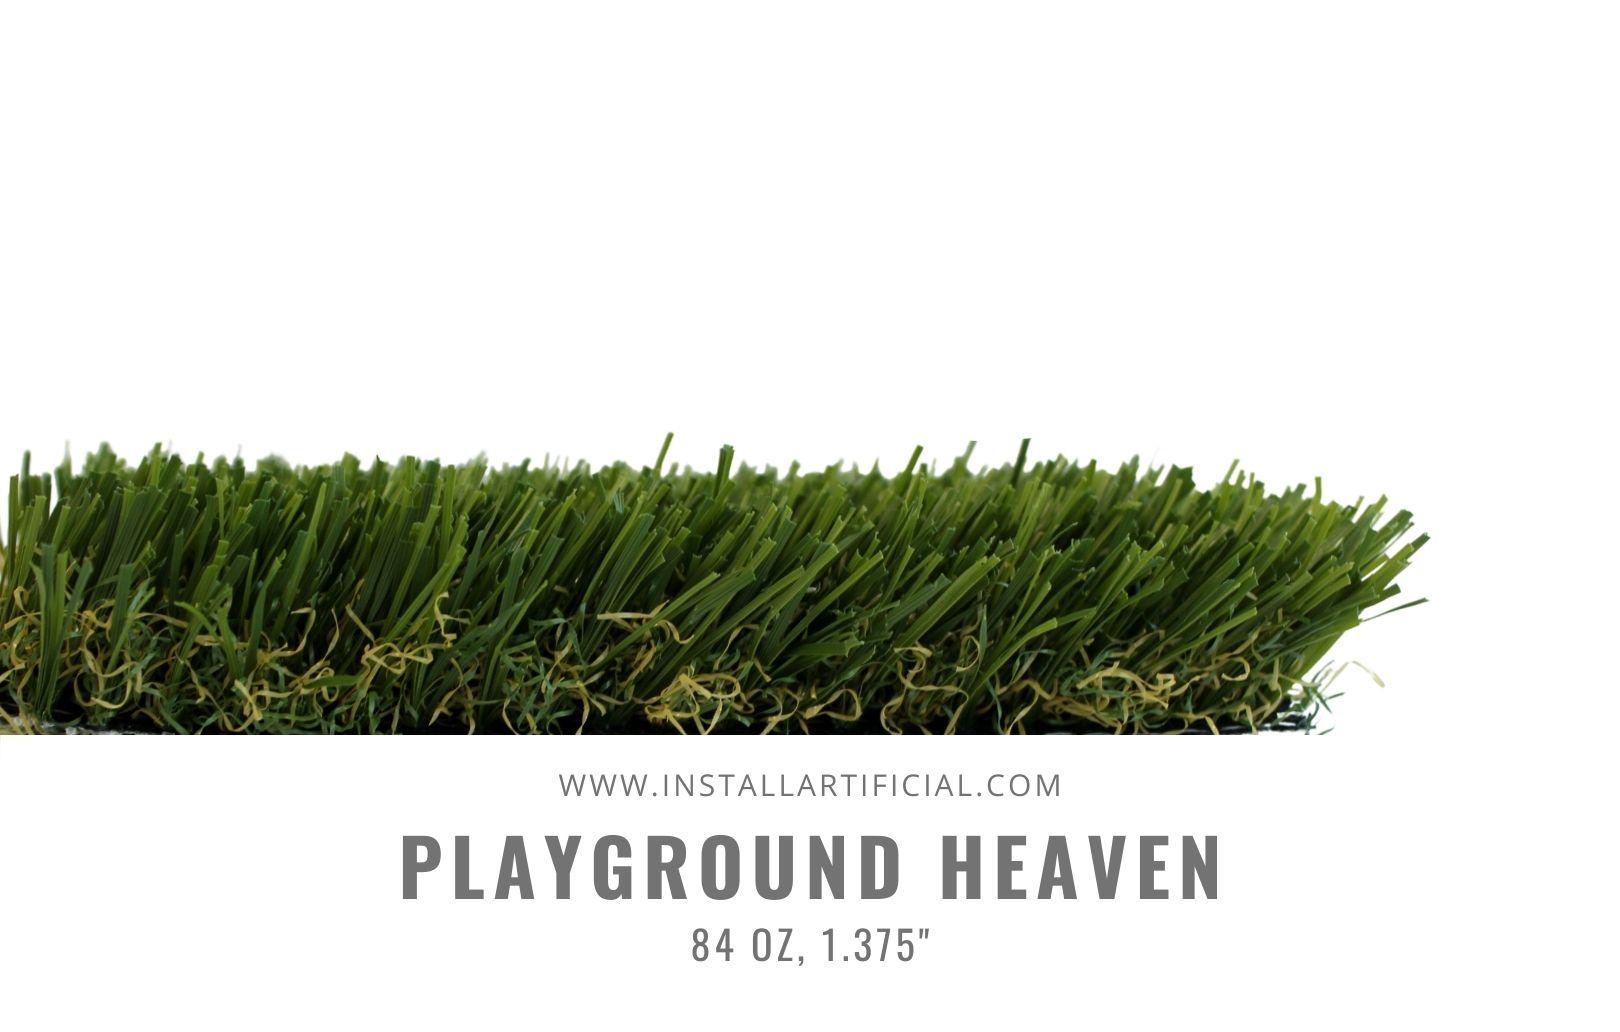 Playground Heaven, side